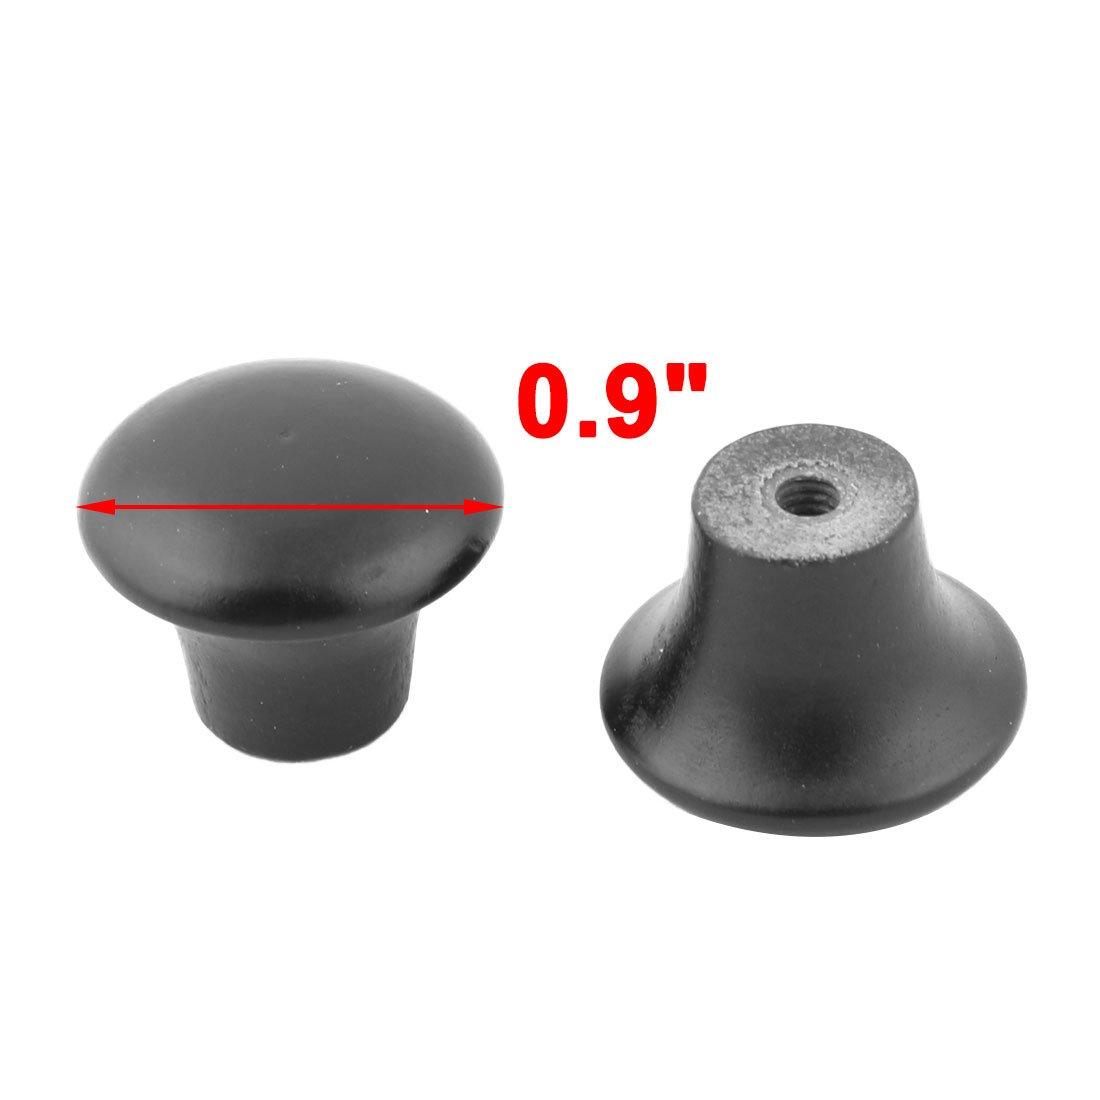 uxcell Home Round Dressing Table Wardrobe Pull Handle Grip Knob 18mm x 23mm 8pcs Black